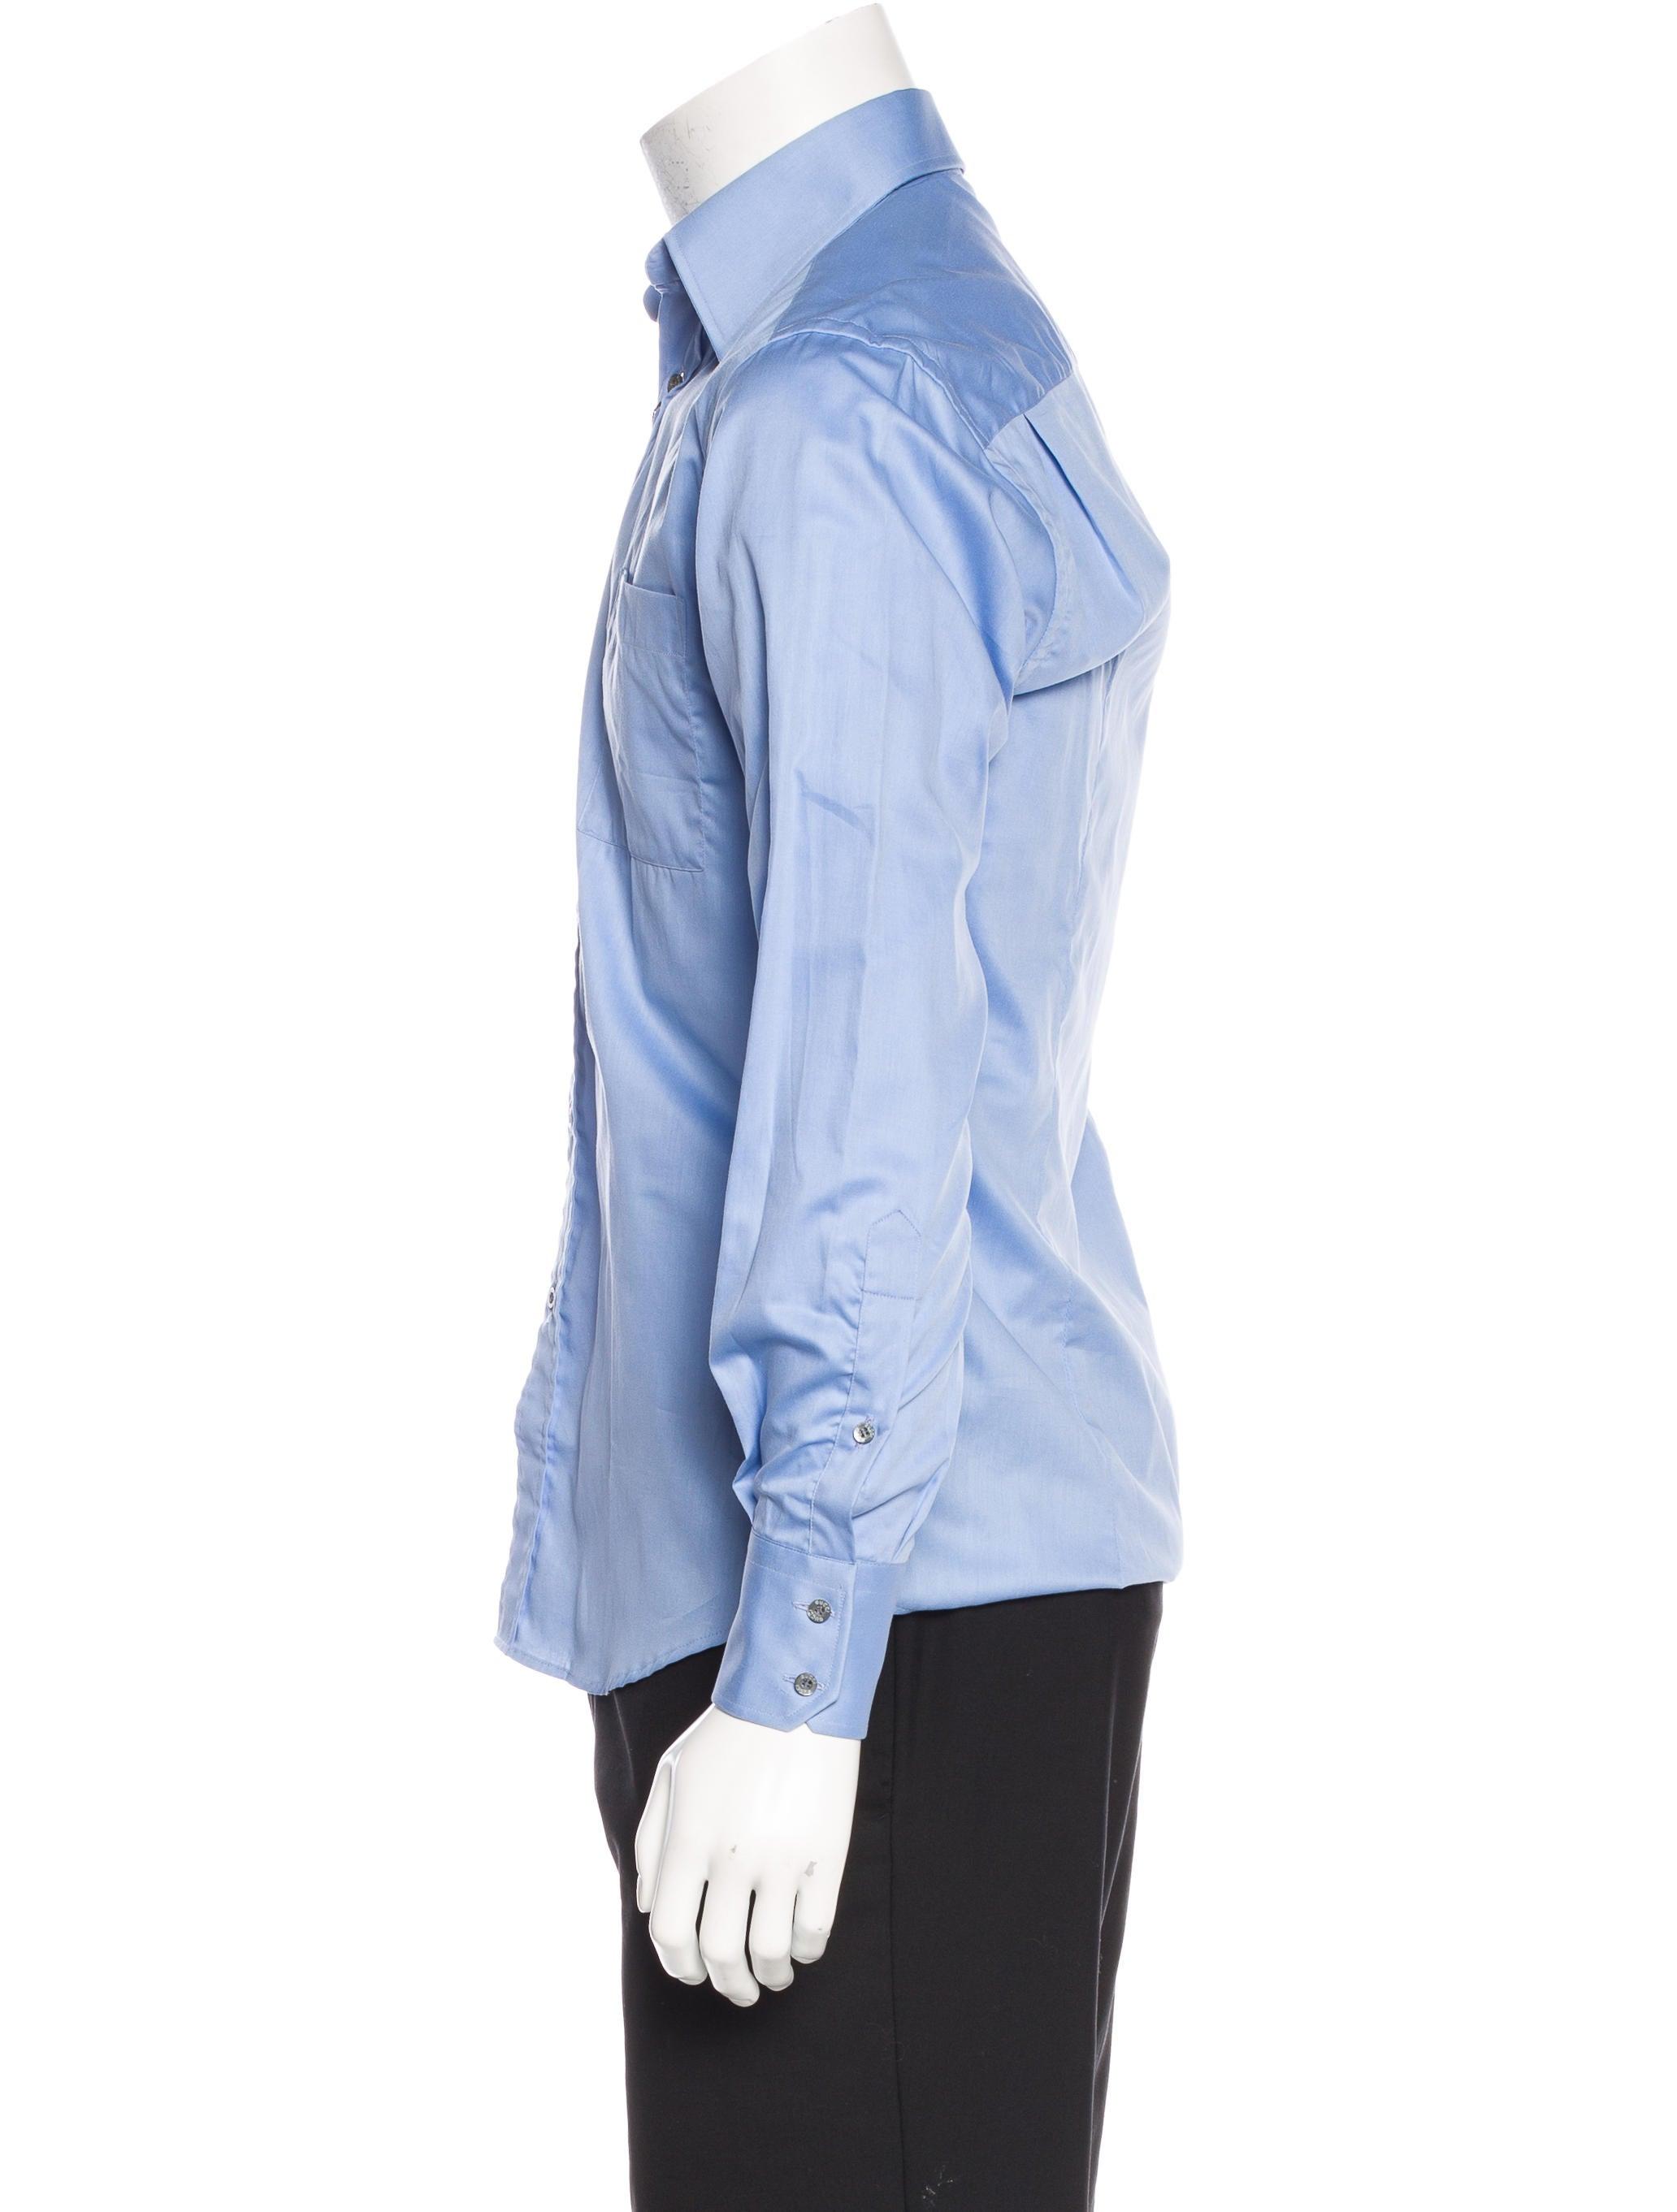 Gucci woven dress shirt w tags clothing guc136991 Woven t shirt tags